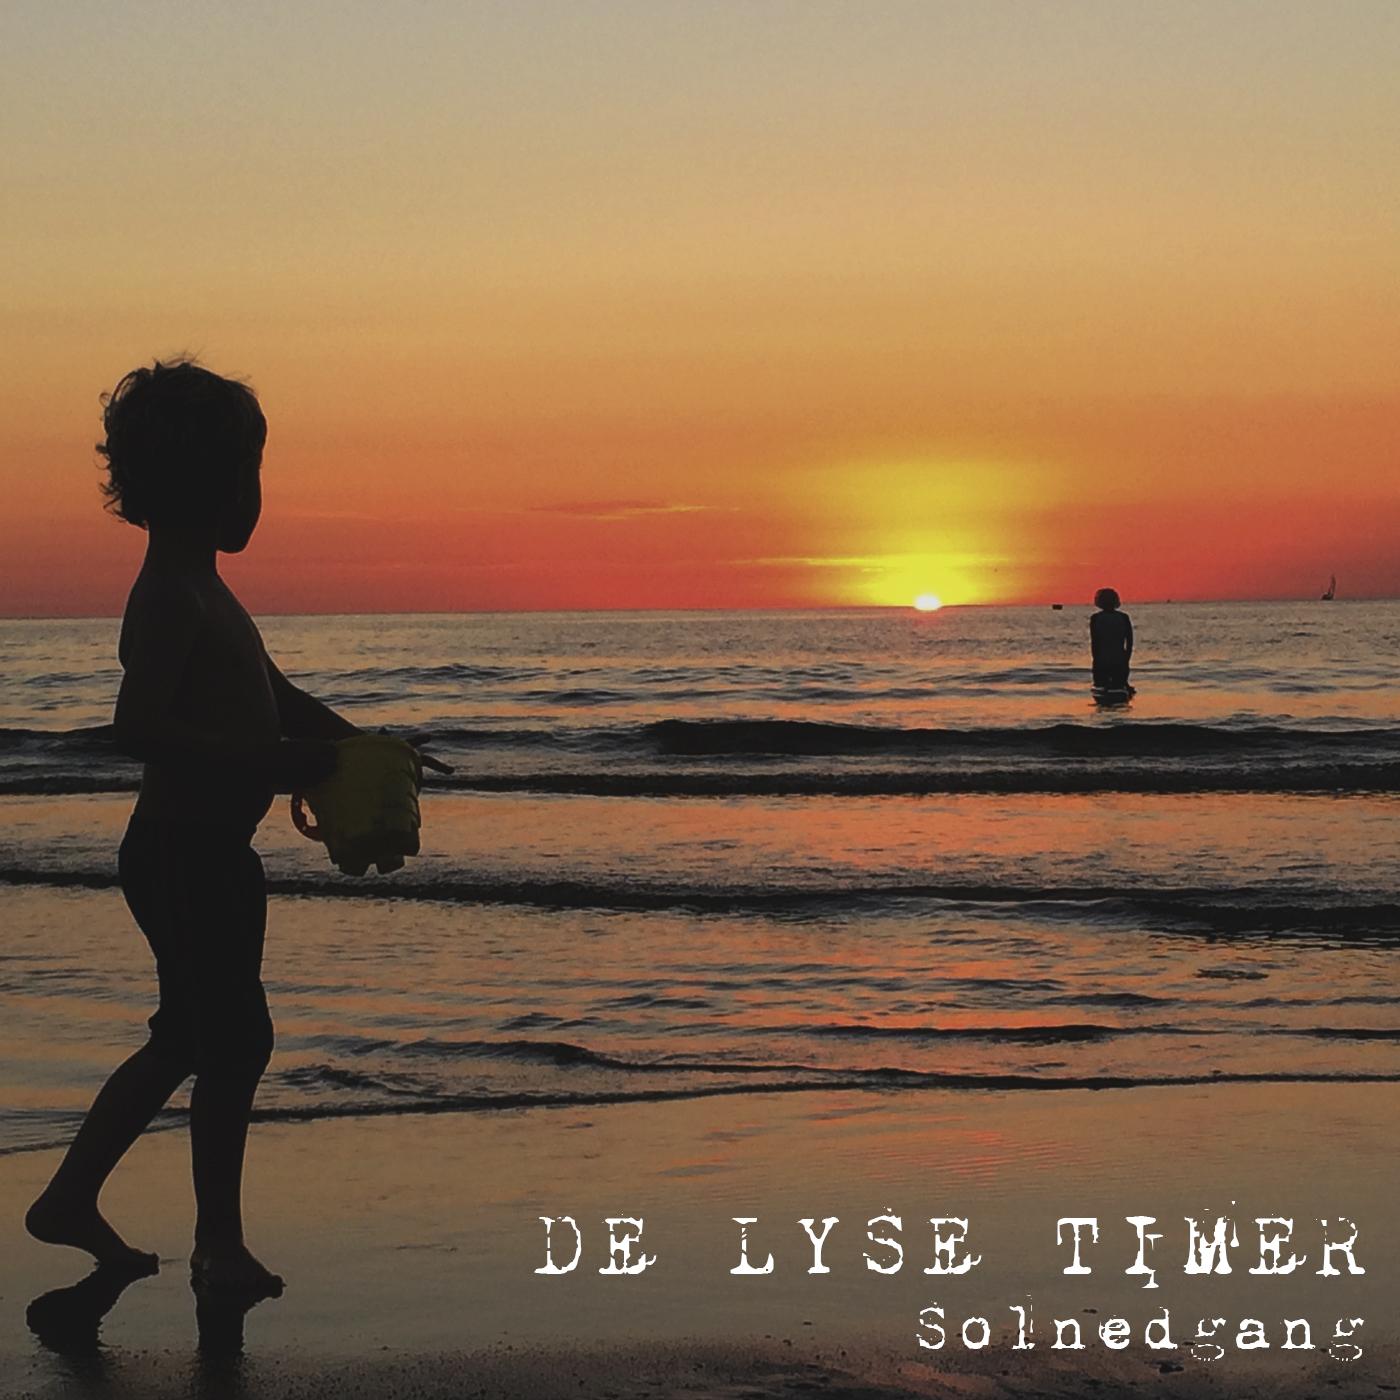 De Lyse Timer – Solnedgang (single)